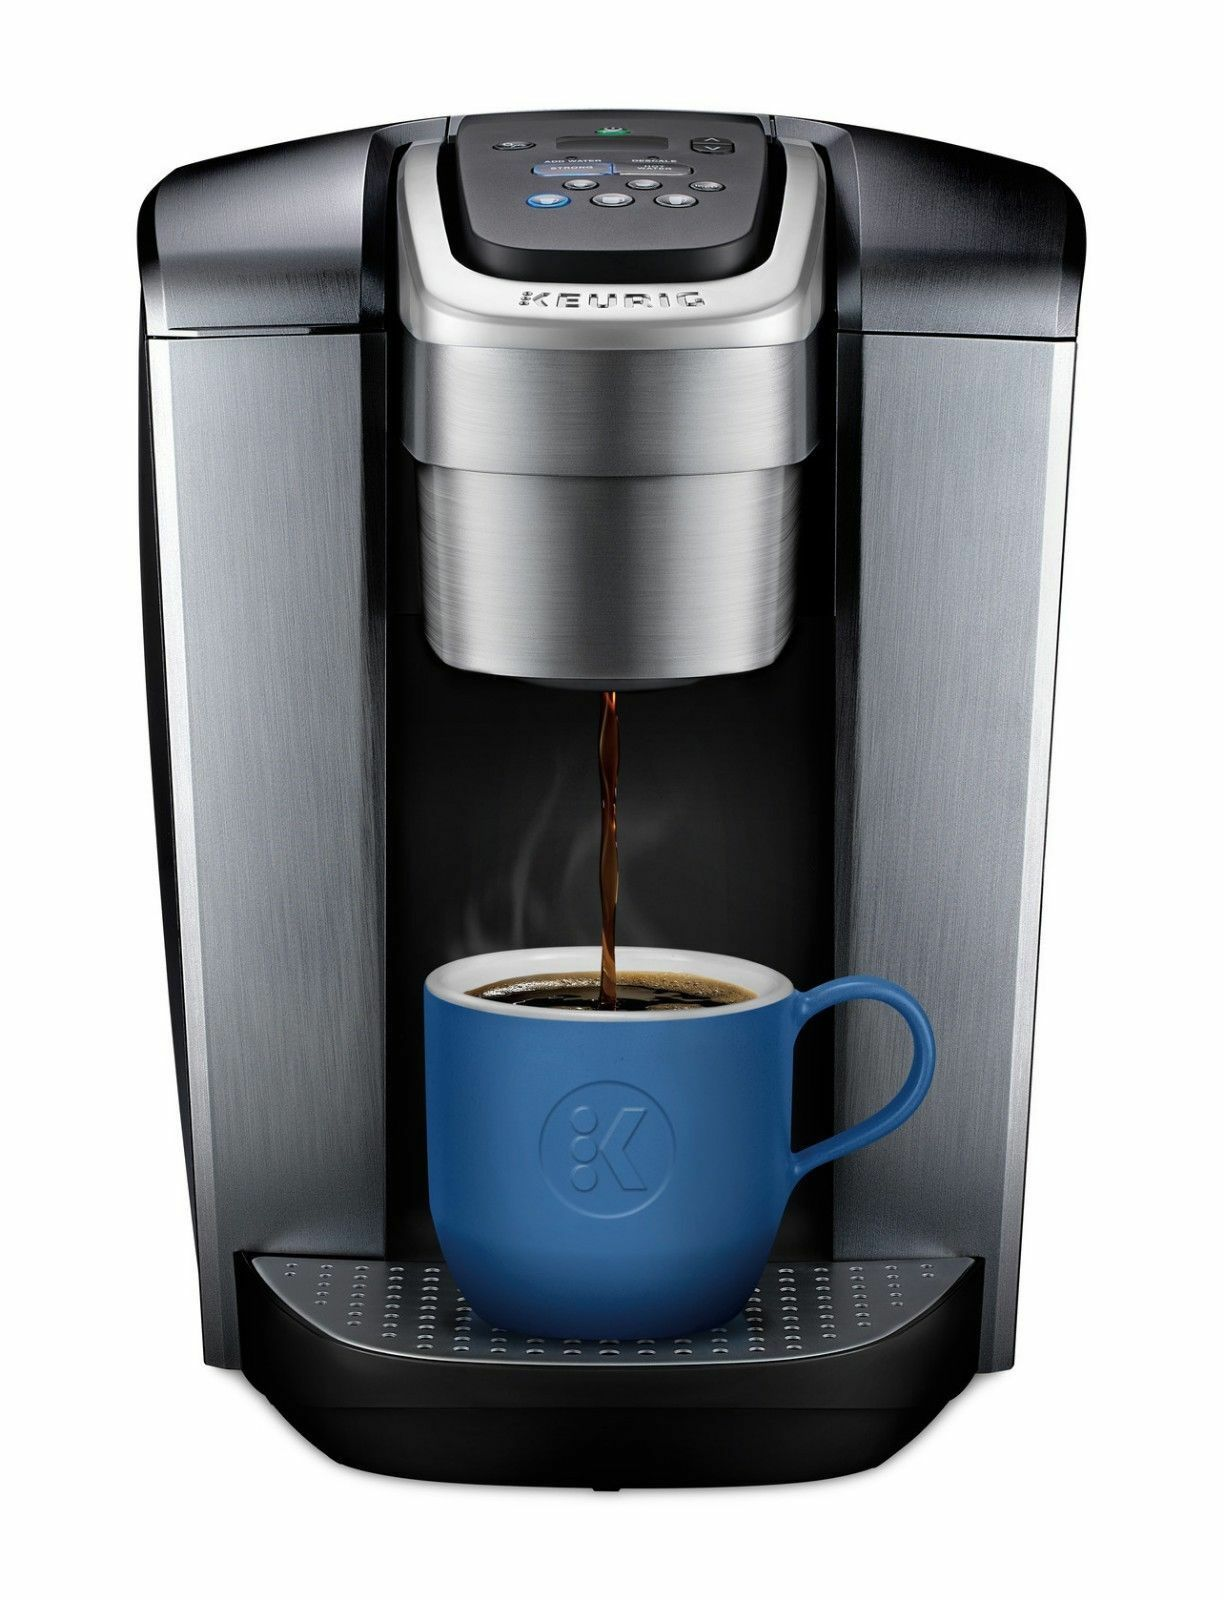 Keurig K-Elite Single Serve Coffee Maker  BRAND nouveau IN BOX